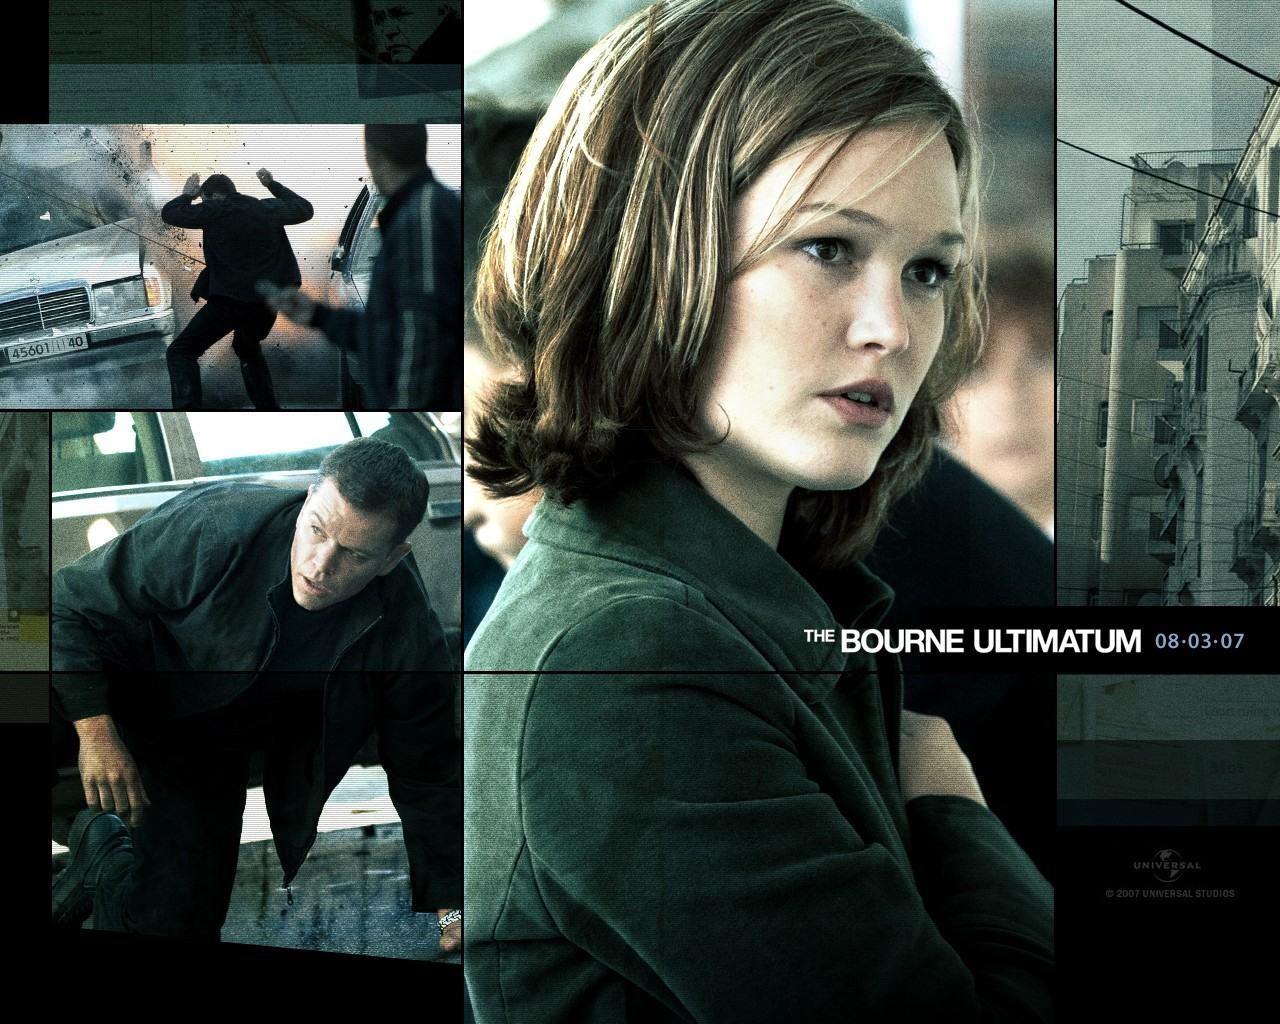 http://2.bp.blogspot.com/_H_wbQtT05C0/TA7ADtJ_DwI/AAAAAAAAAHY/mNTwsdLG-Ys/s1600/The-Bourne-Ultimatum.jpg